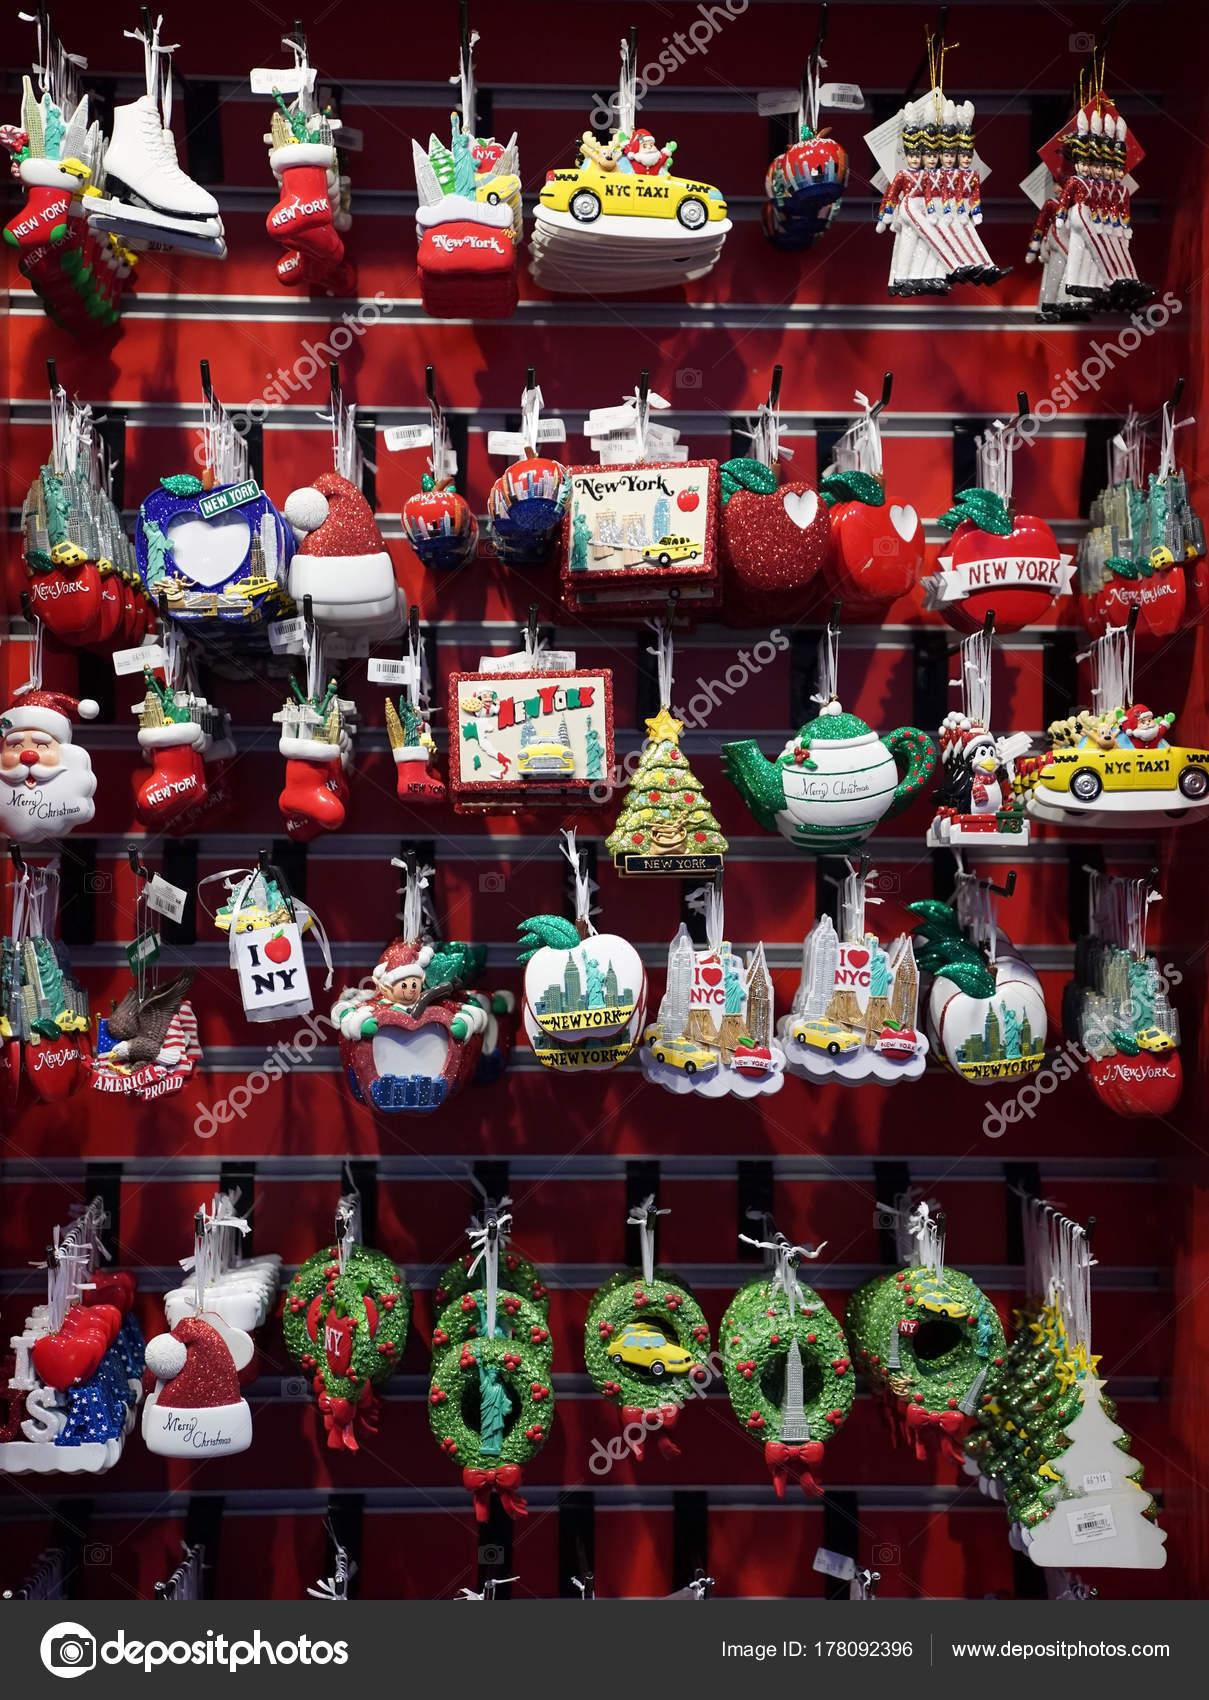 New York December 2017 New York City Themed Christmas Ornaments ...